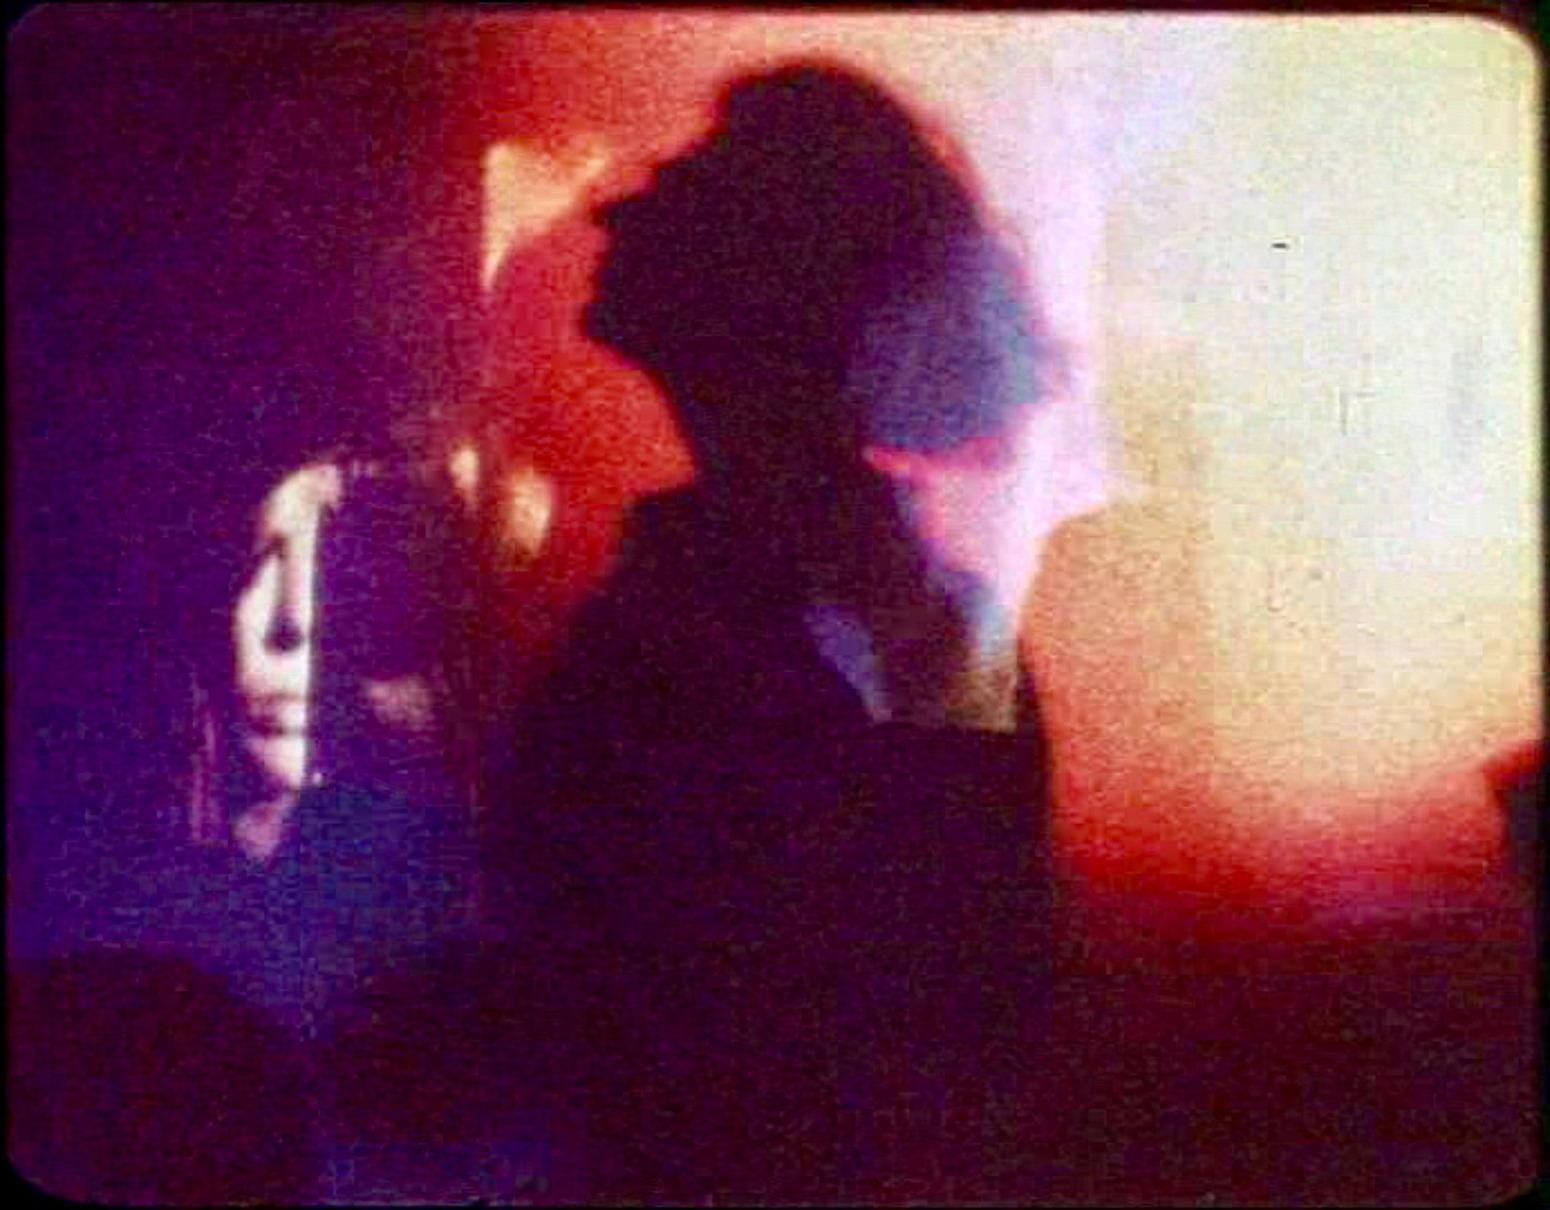 Nico Icon - Music- Regie Susanne Ofteringer - Kamera Judith Kaufmann